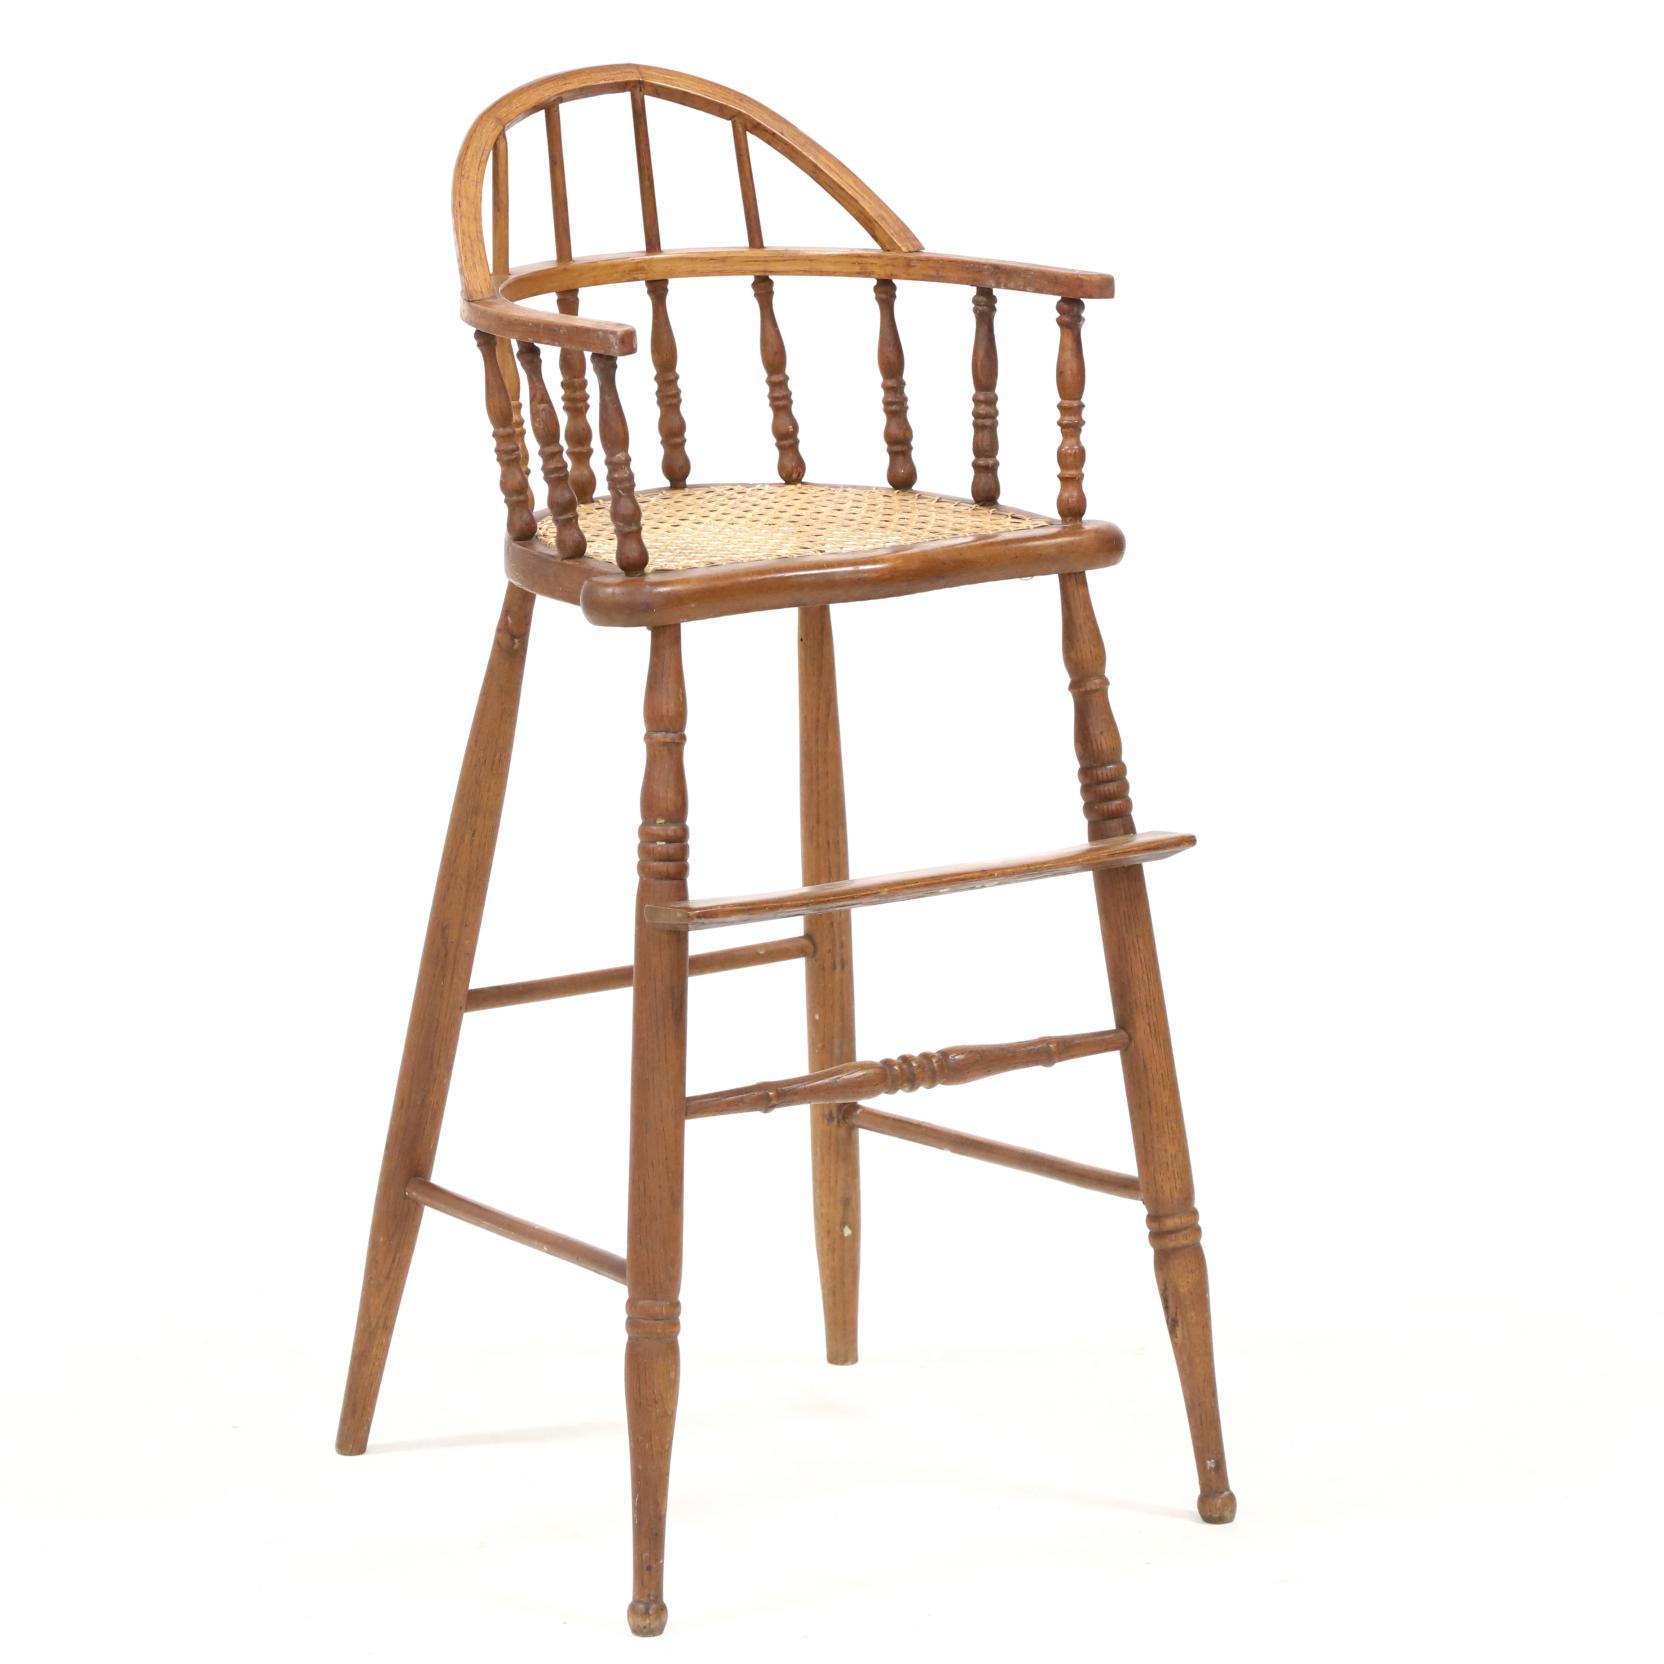 antique-child-s-high-chair